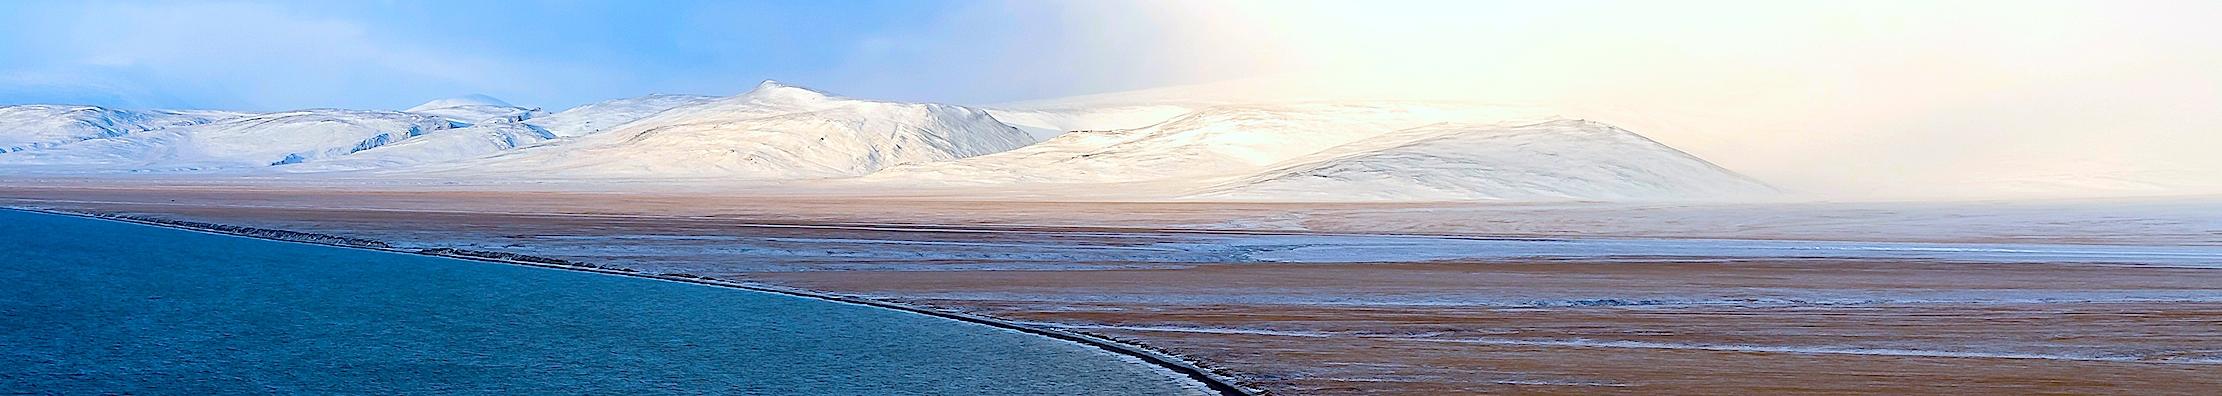 Wrangel Islands Arctique Russe